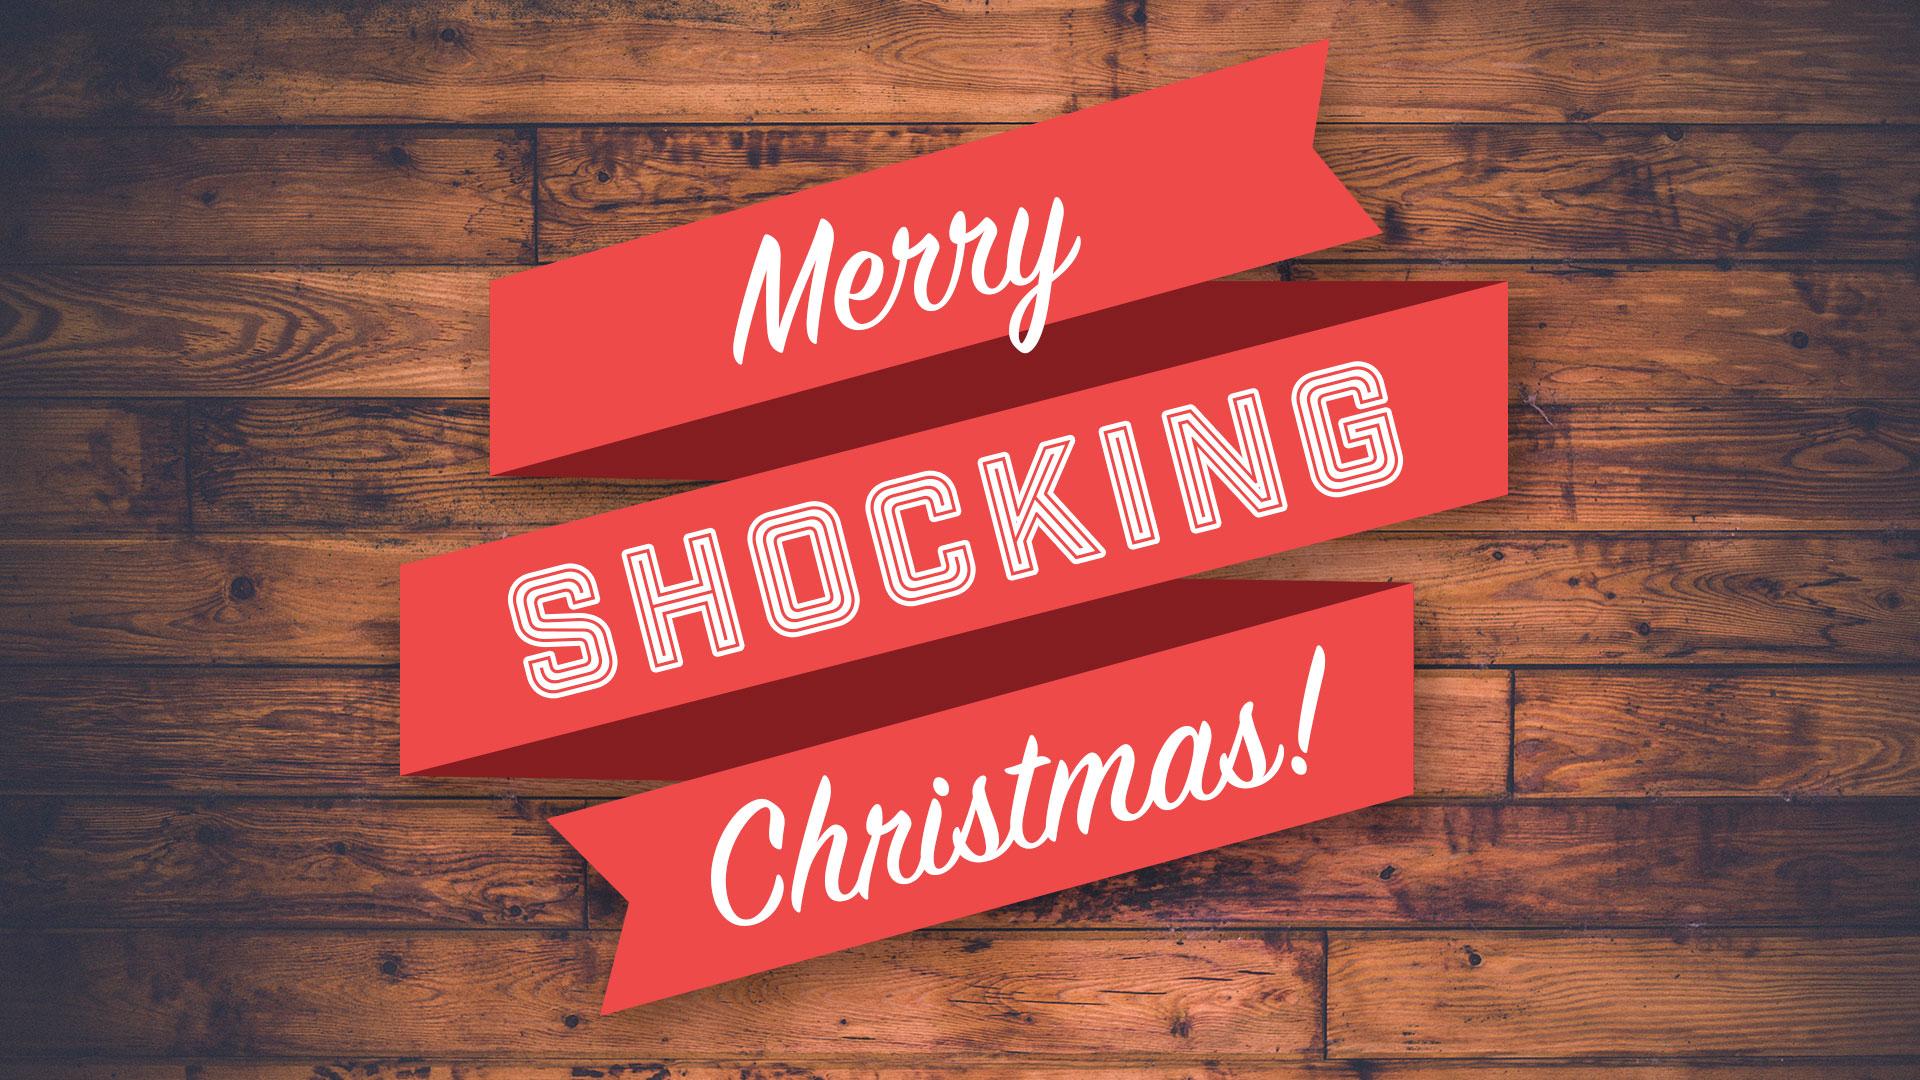 A Shocking Christmas